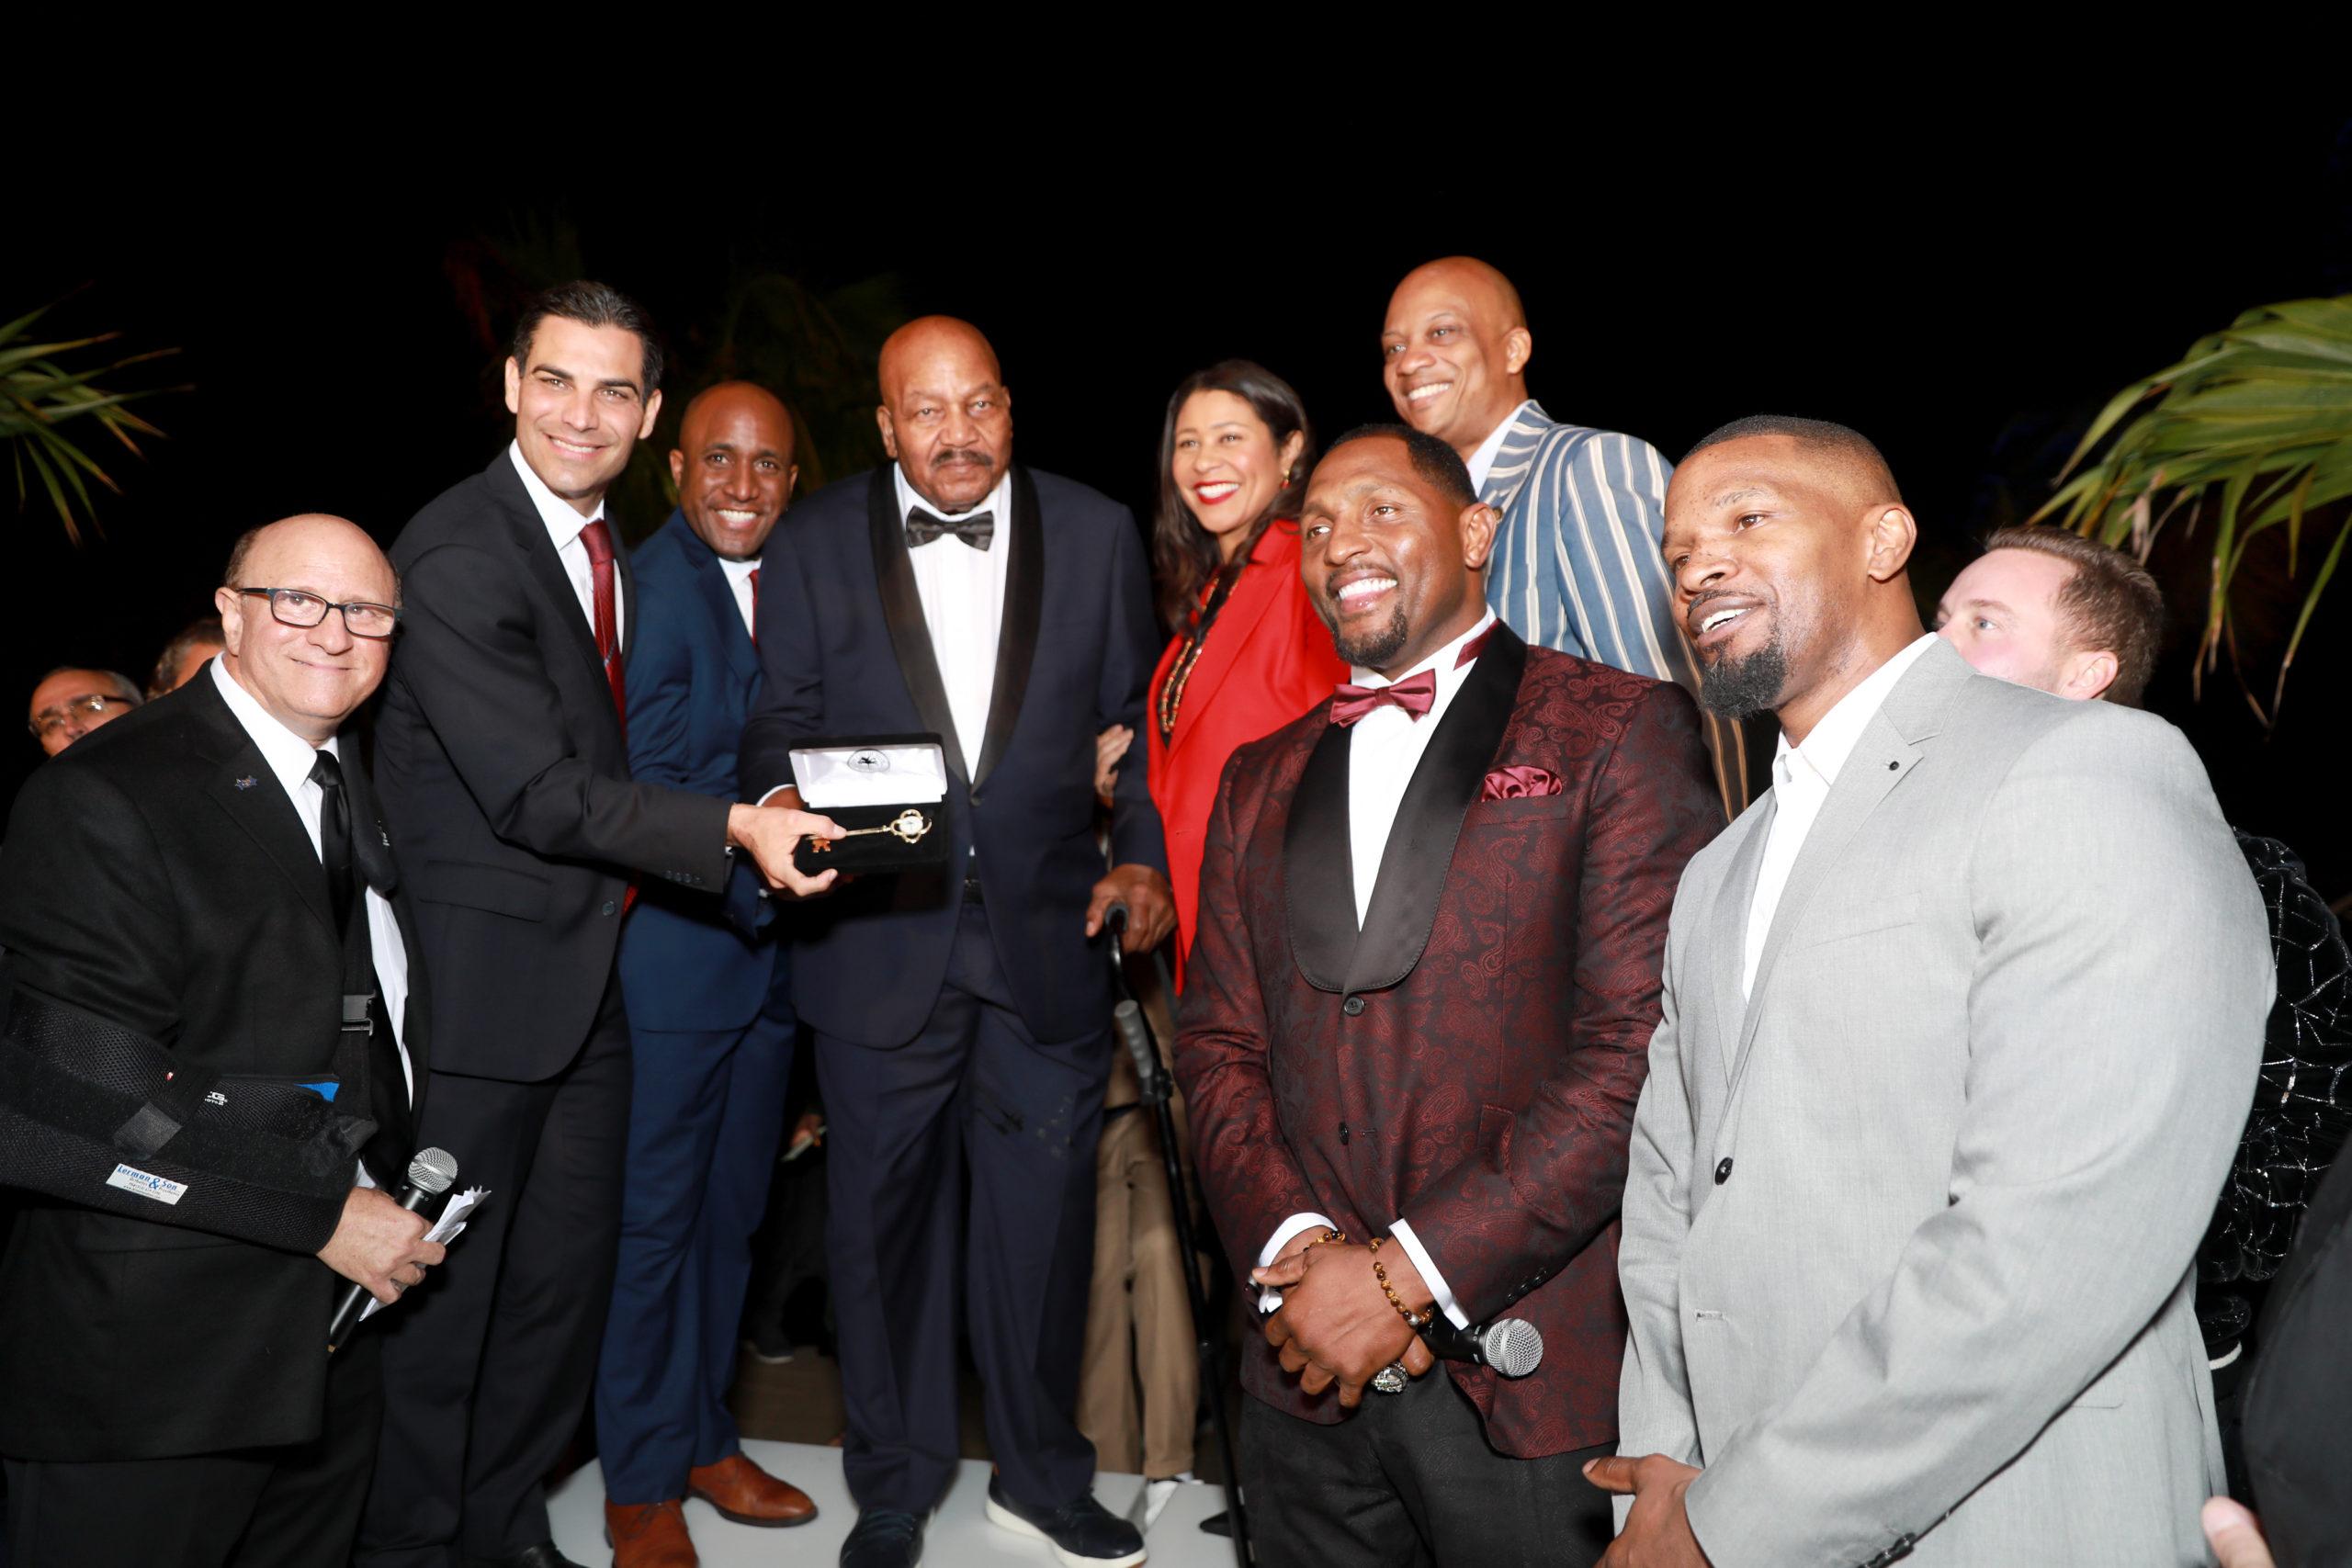 VIP Party Honors Jim Brown Before Super Bowl LIV